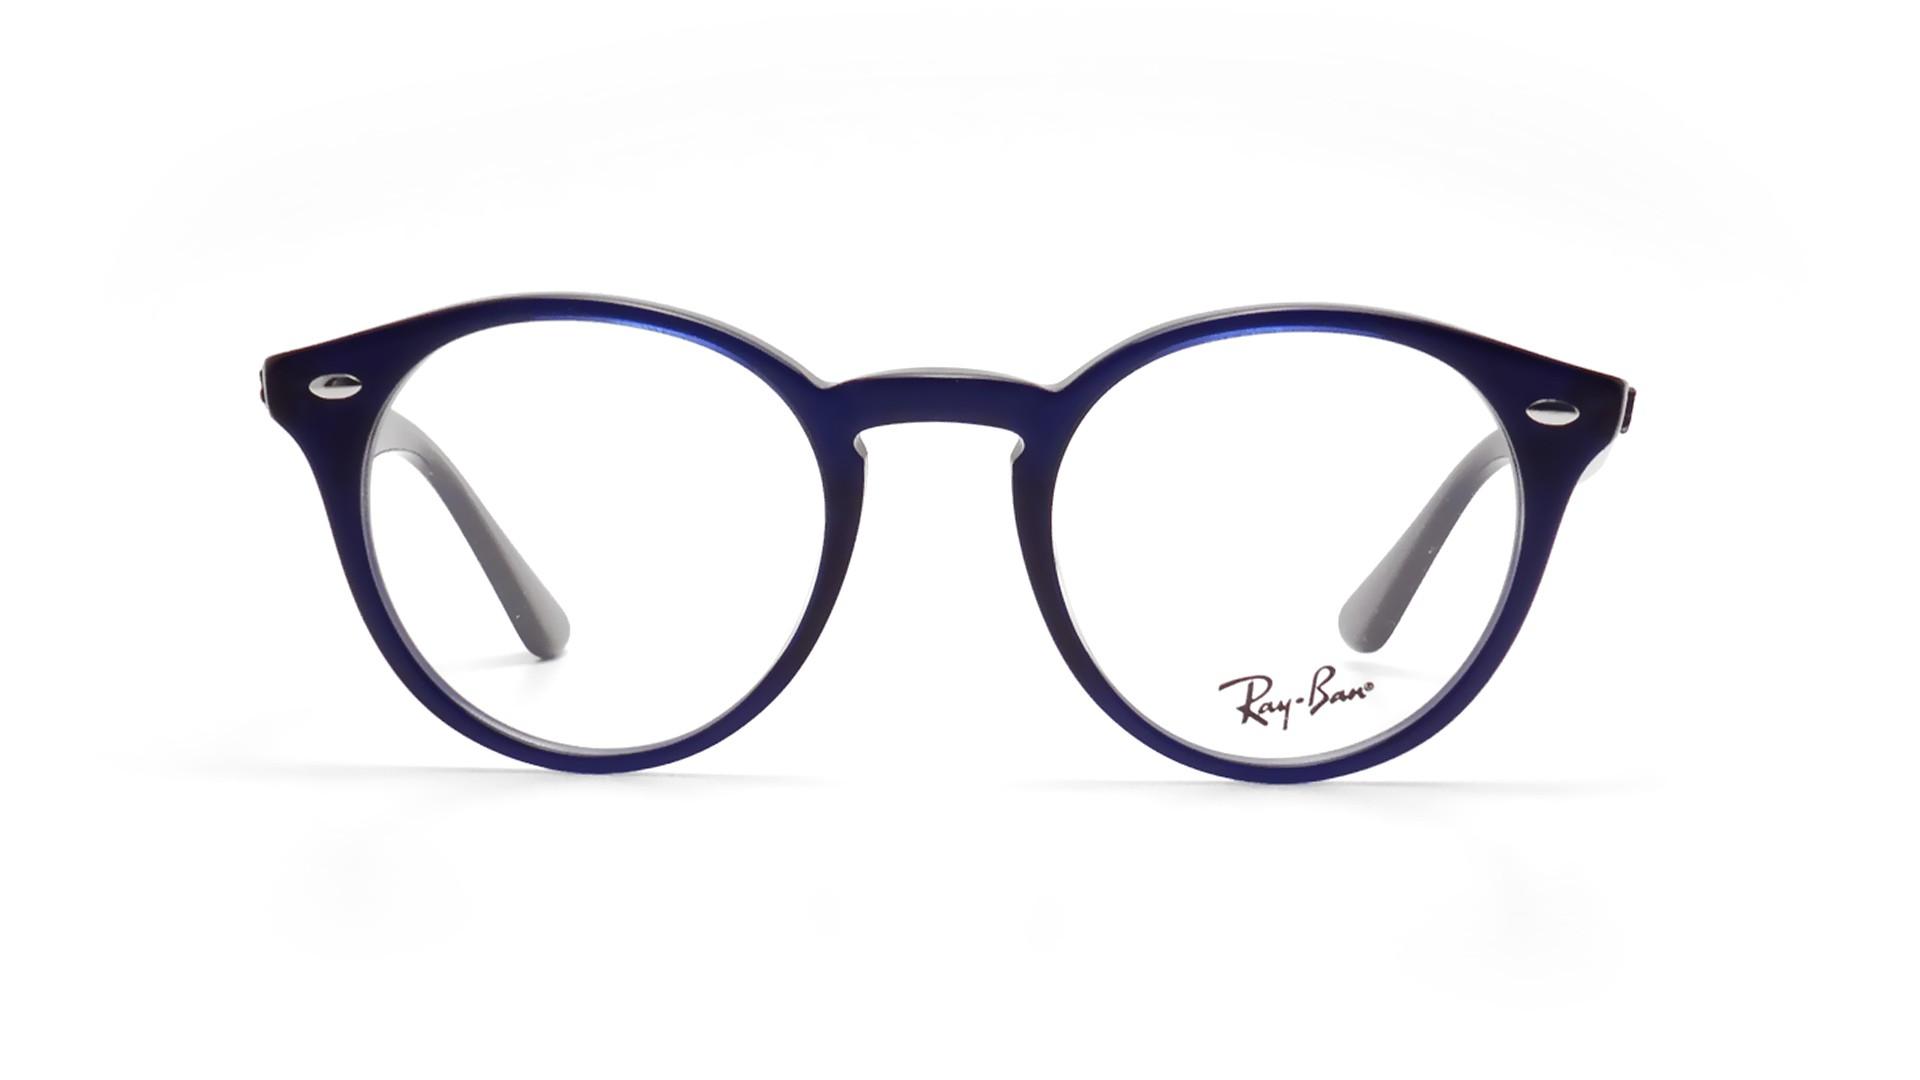 aa073b6cca Ray Ban RB 2180-V 2013 Blue Round Eyeglasses Frames 47mm - 3 ...